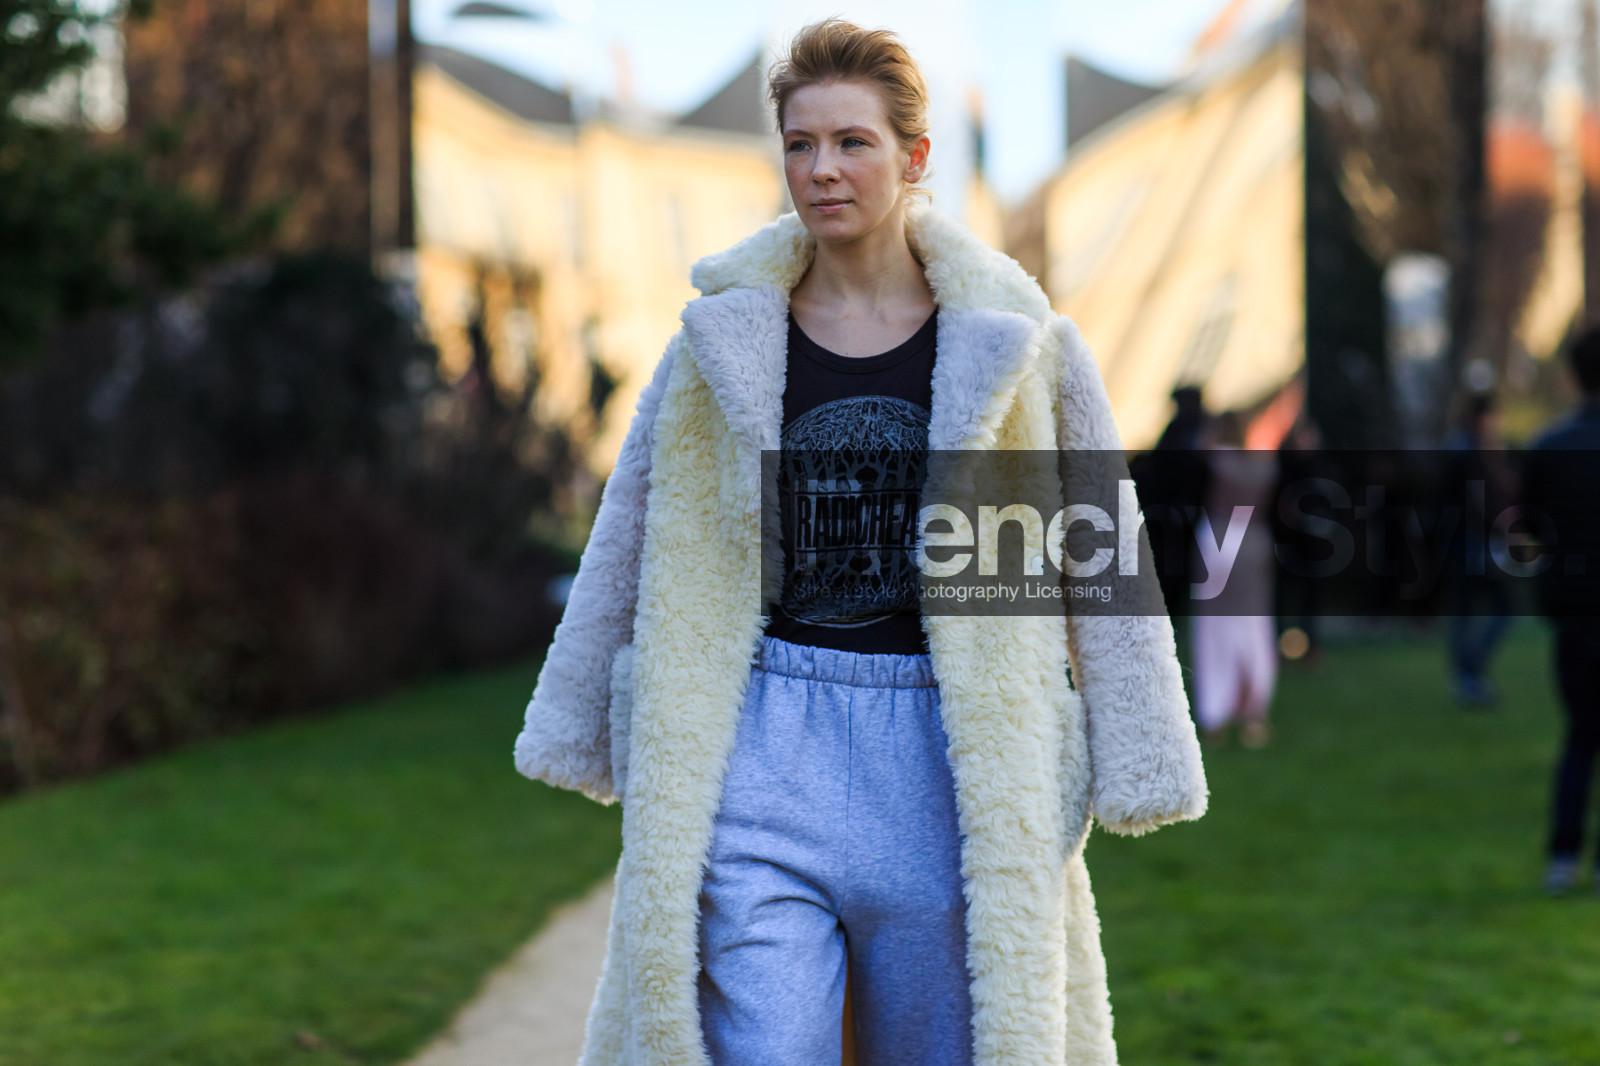 Black t shirt grey pants - Atmosphere Details Black T Shirt Detail Fashion Week Frenchystyle Fur Coat